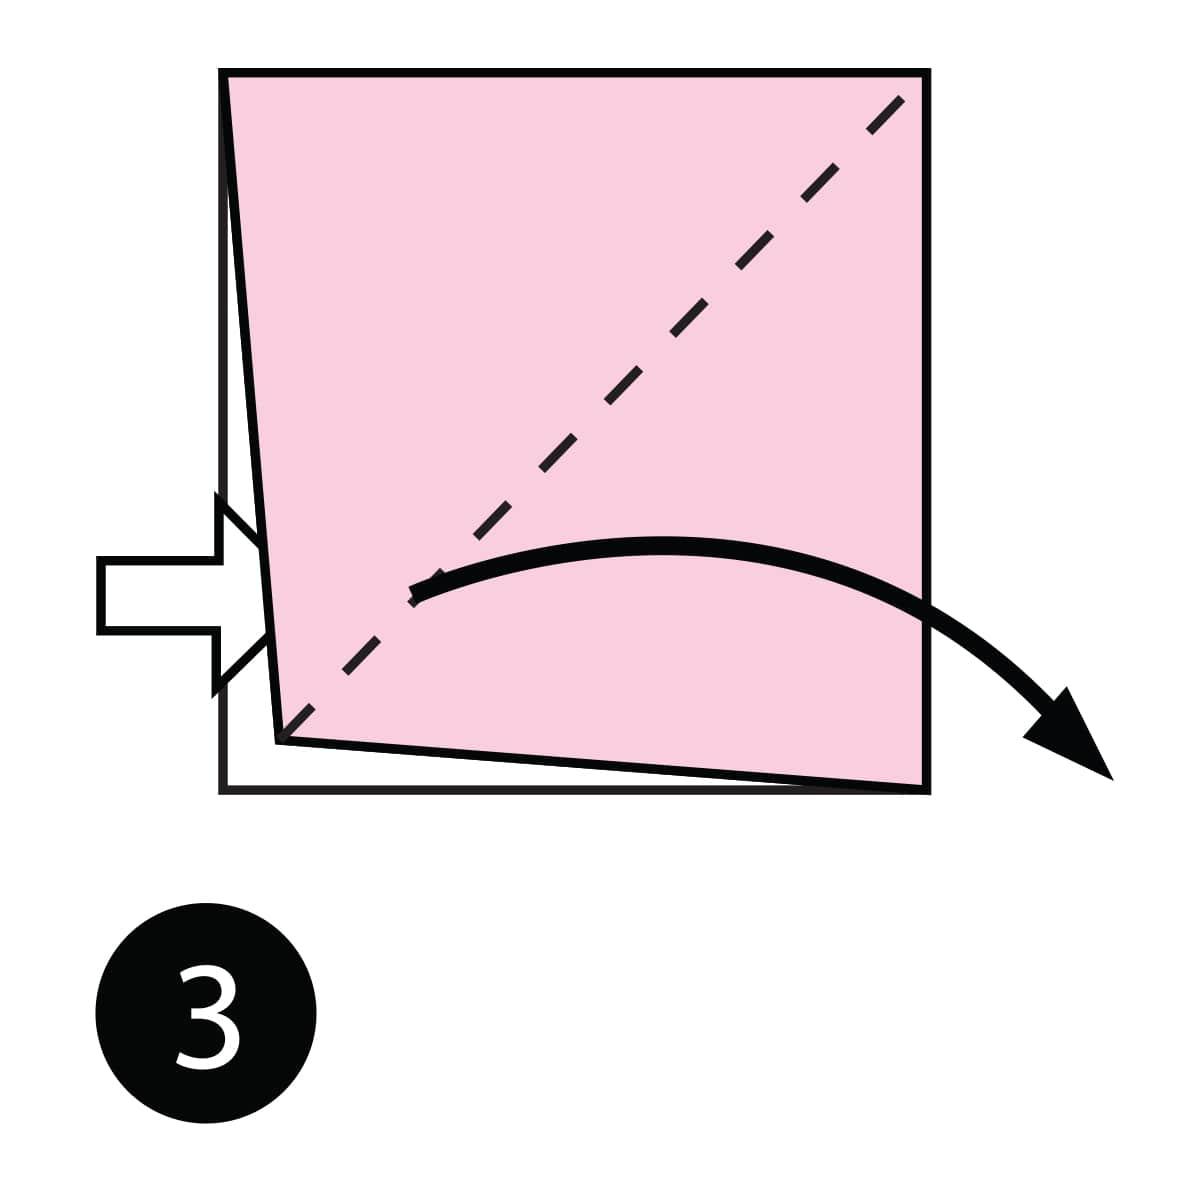 Winged Balloon Step 3